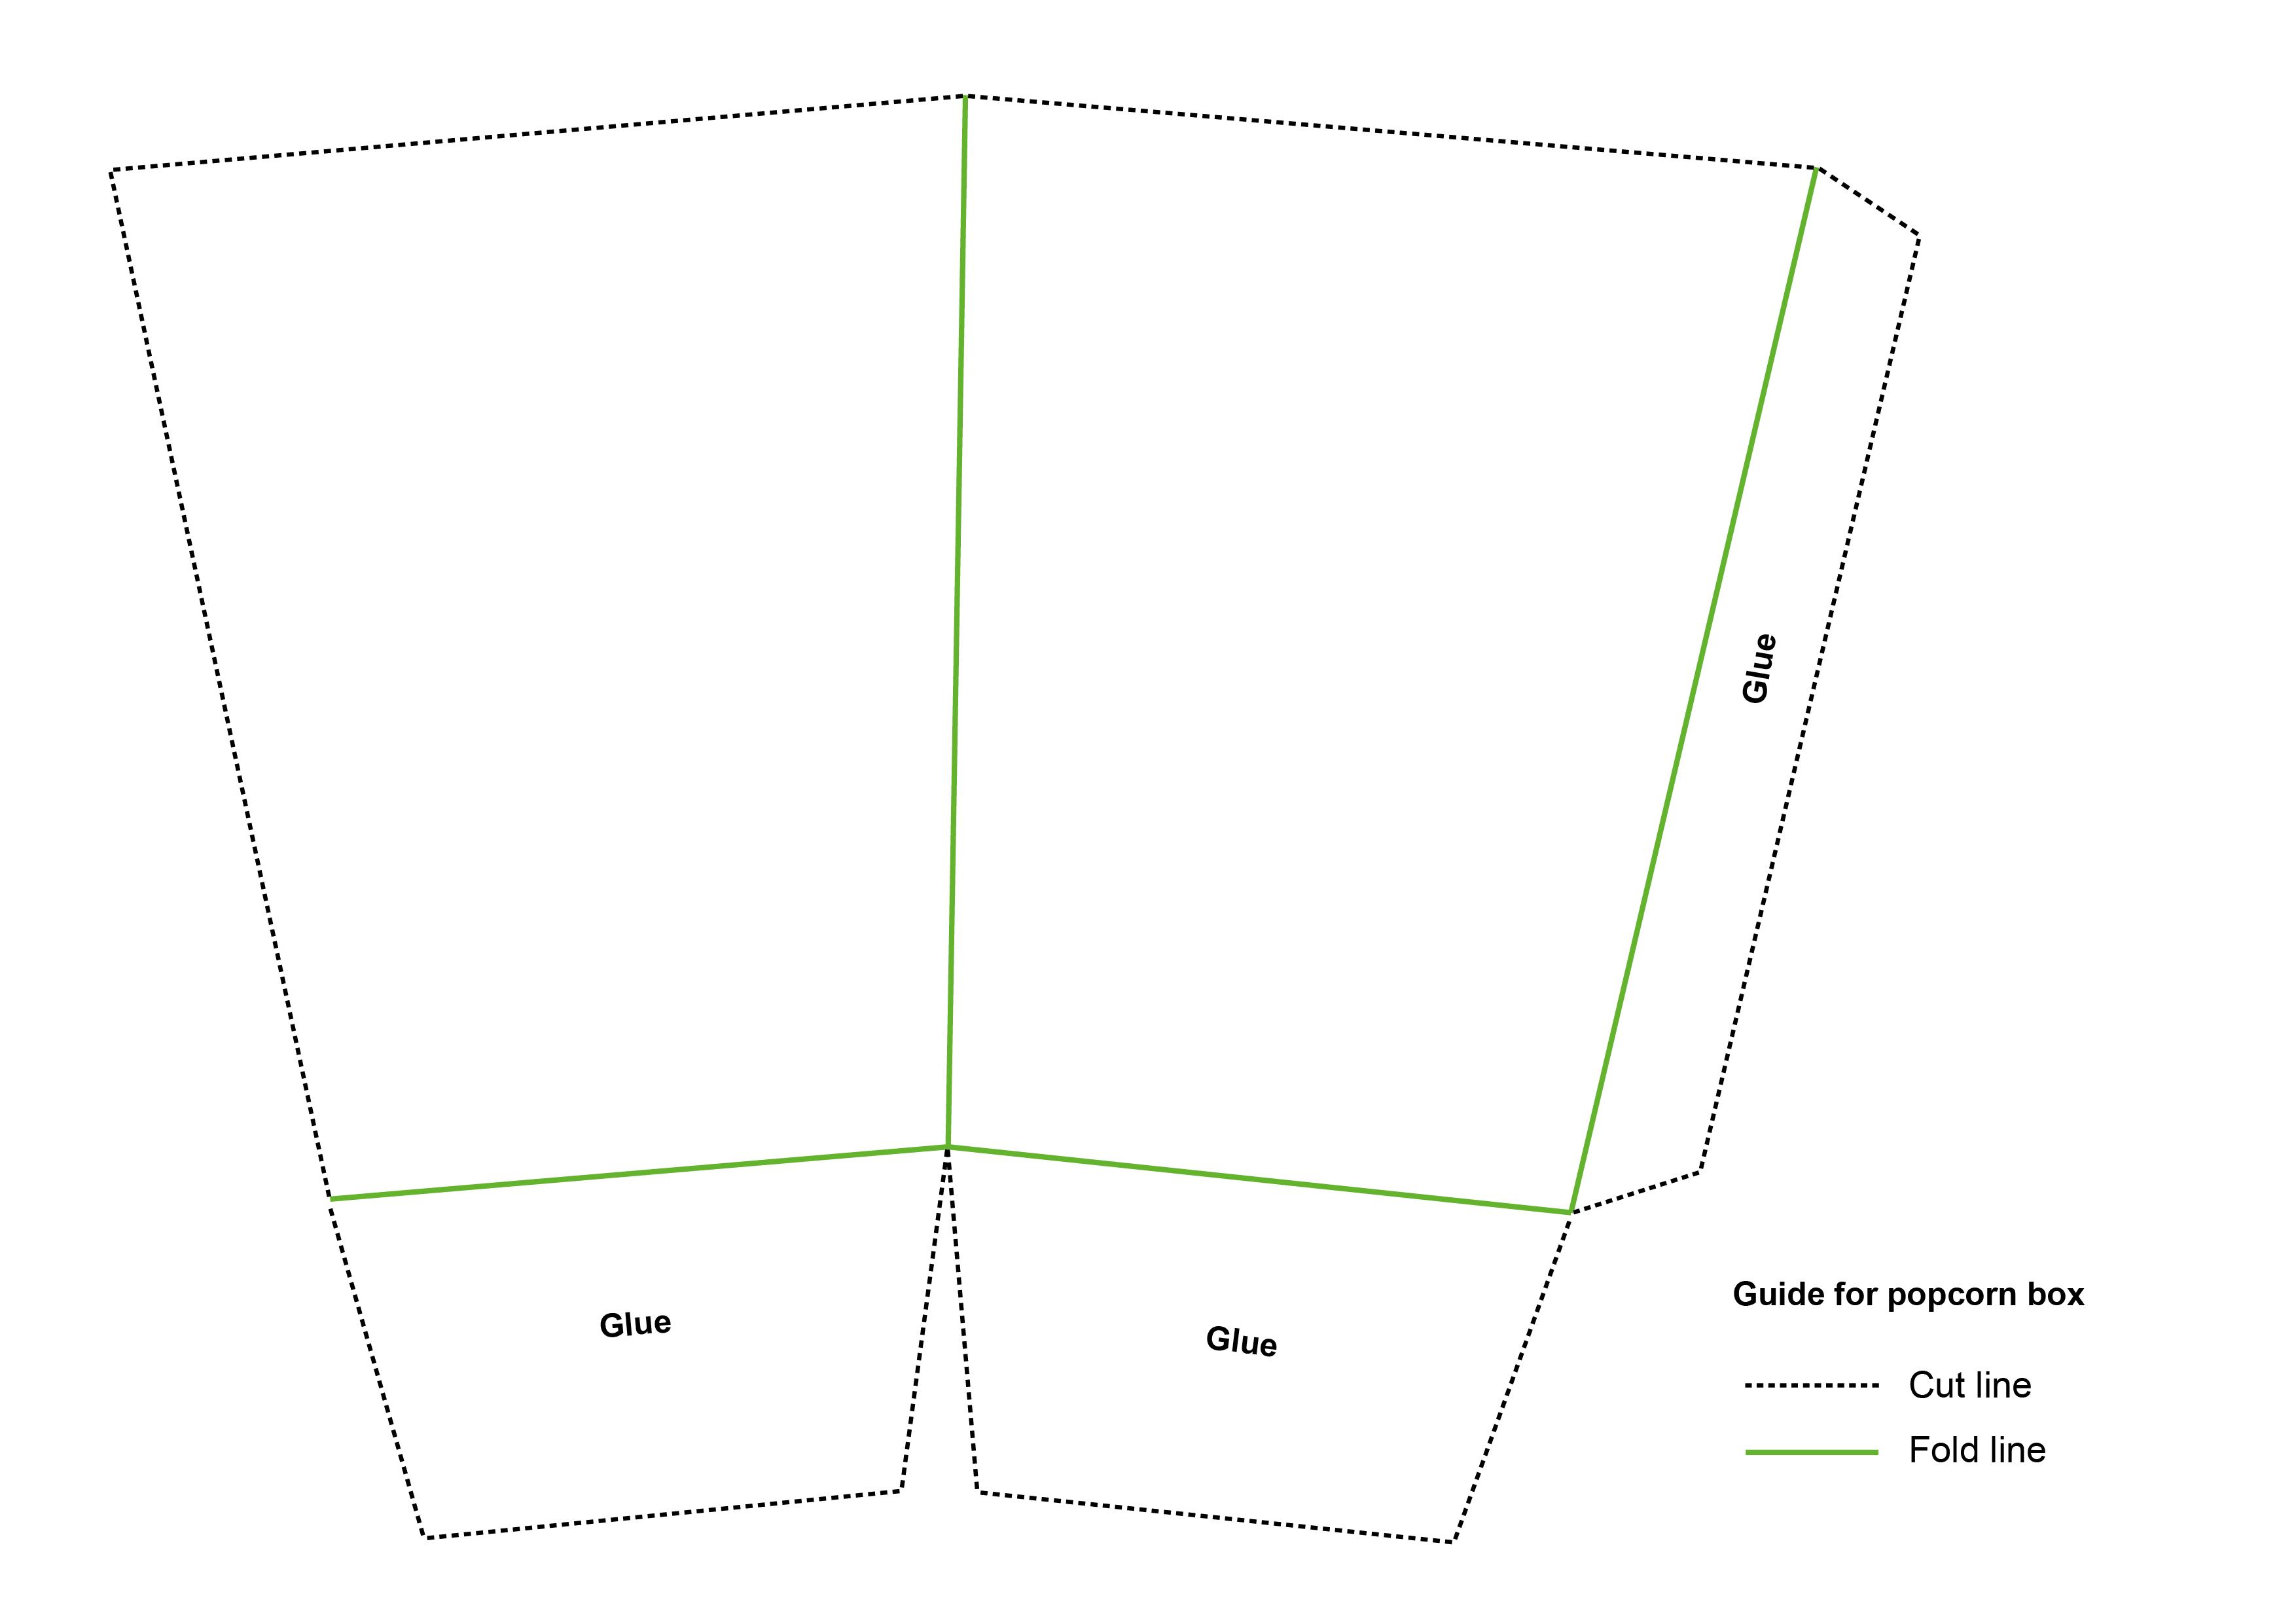 Popcorn Box Guide.jpg